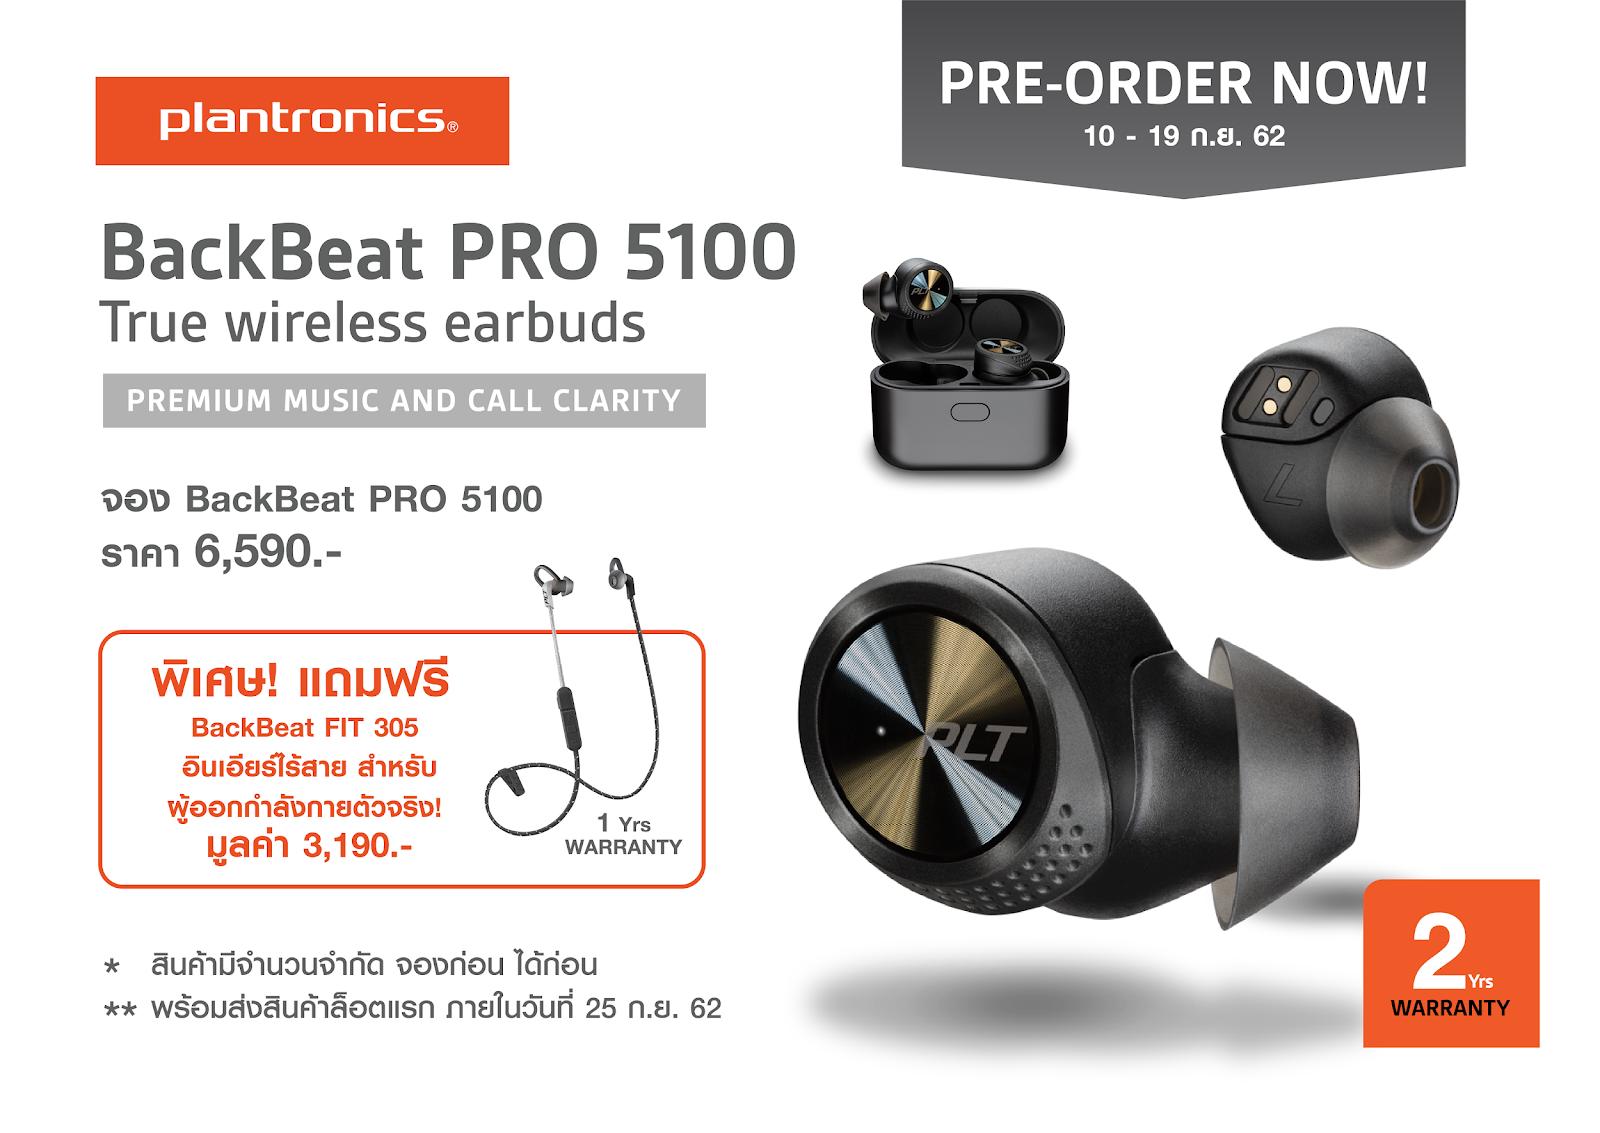 "Plantronics เปิดตัว ""BackBeat PRO 5100"", ""BackBeat FIT 3200"" True Wireless ใหม่ล่าสุด ทำงานก็ได้ ออกกำลังกายก็โดน"